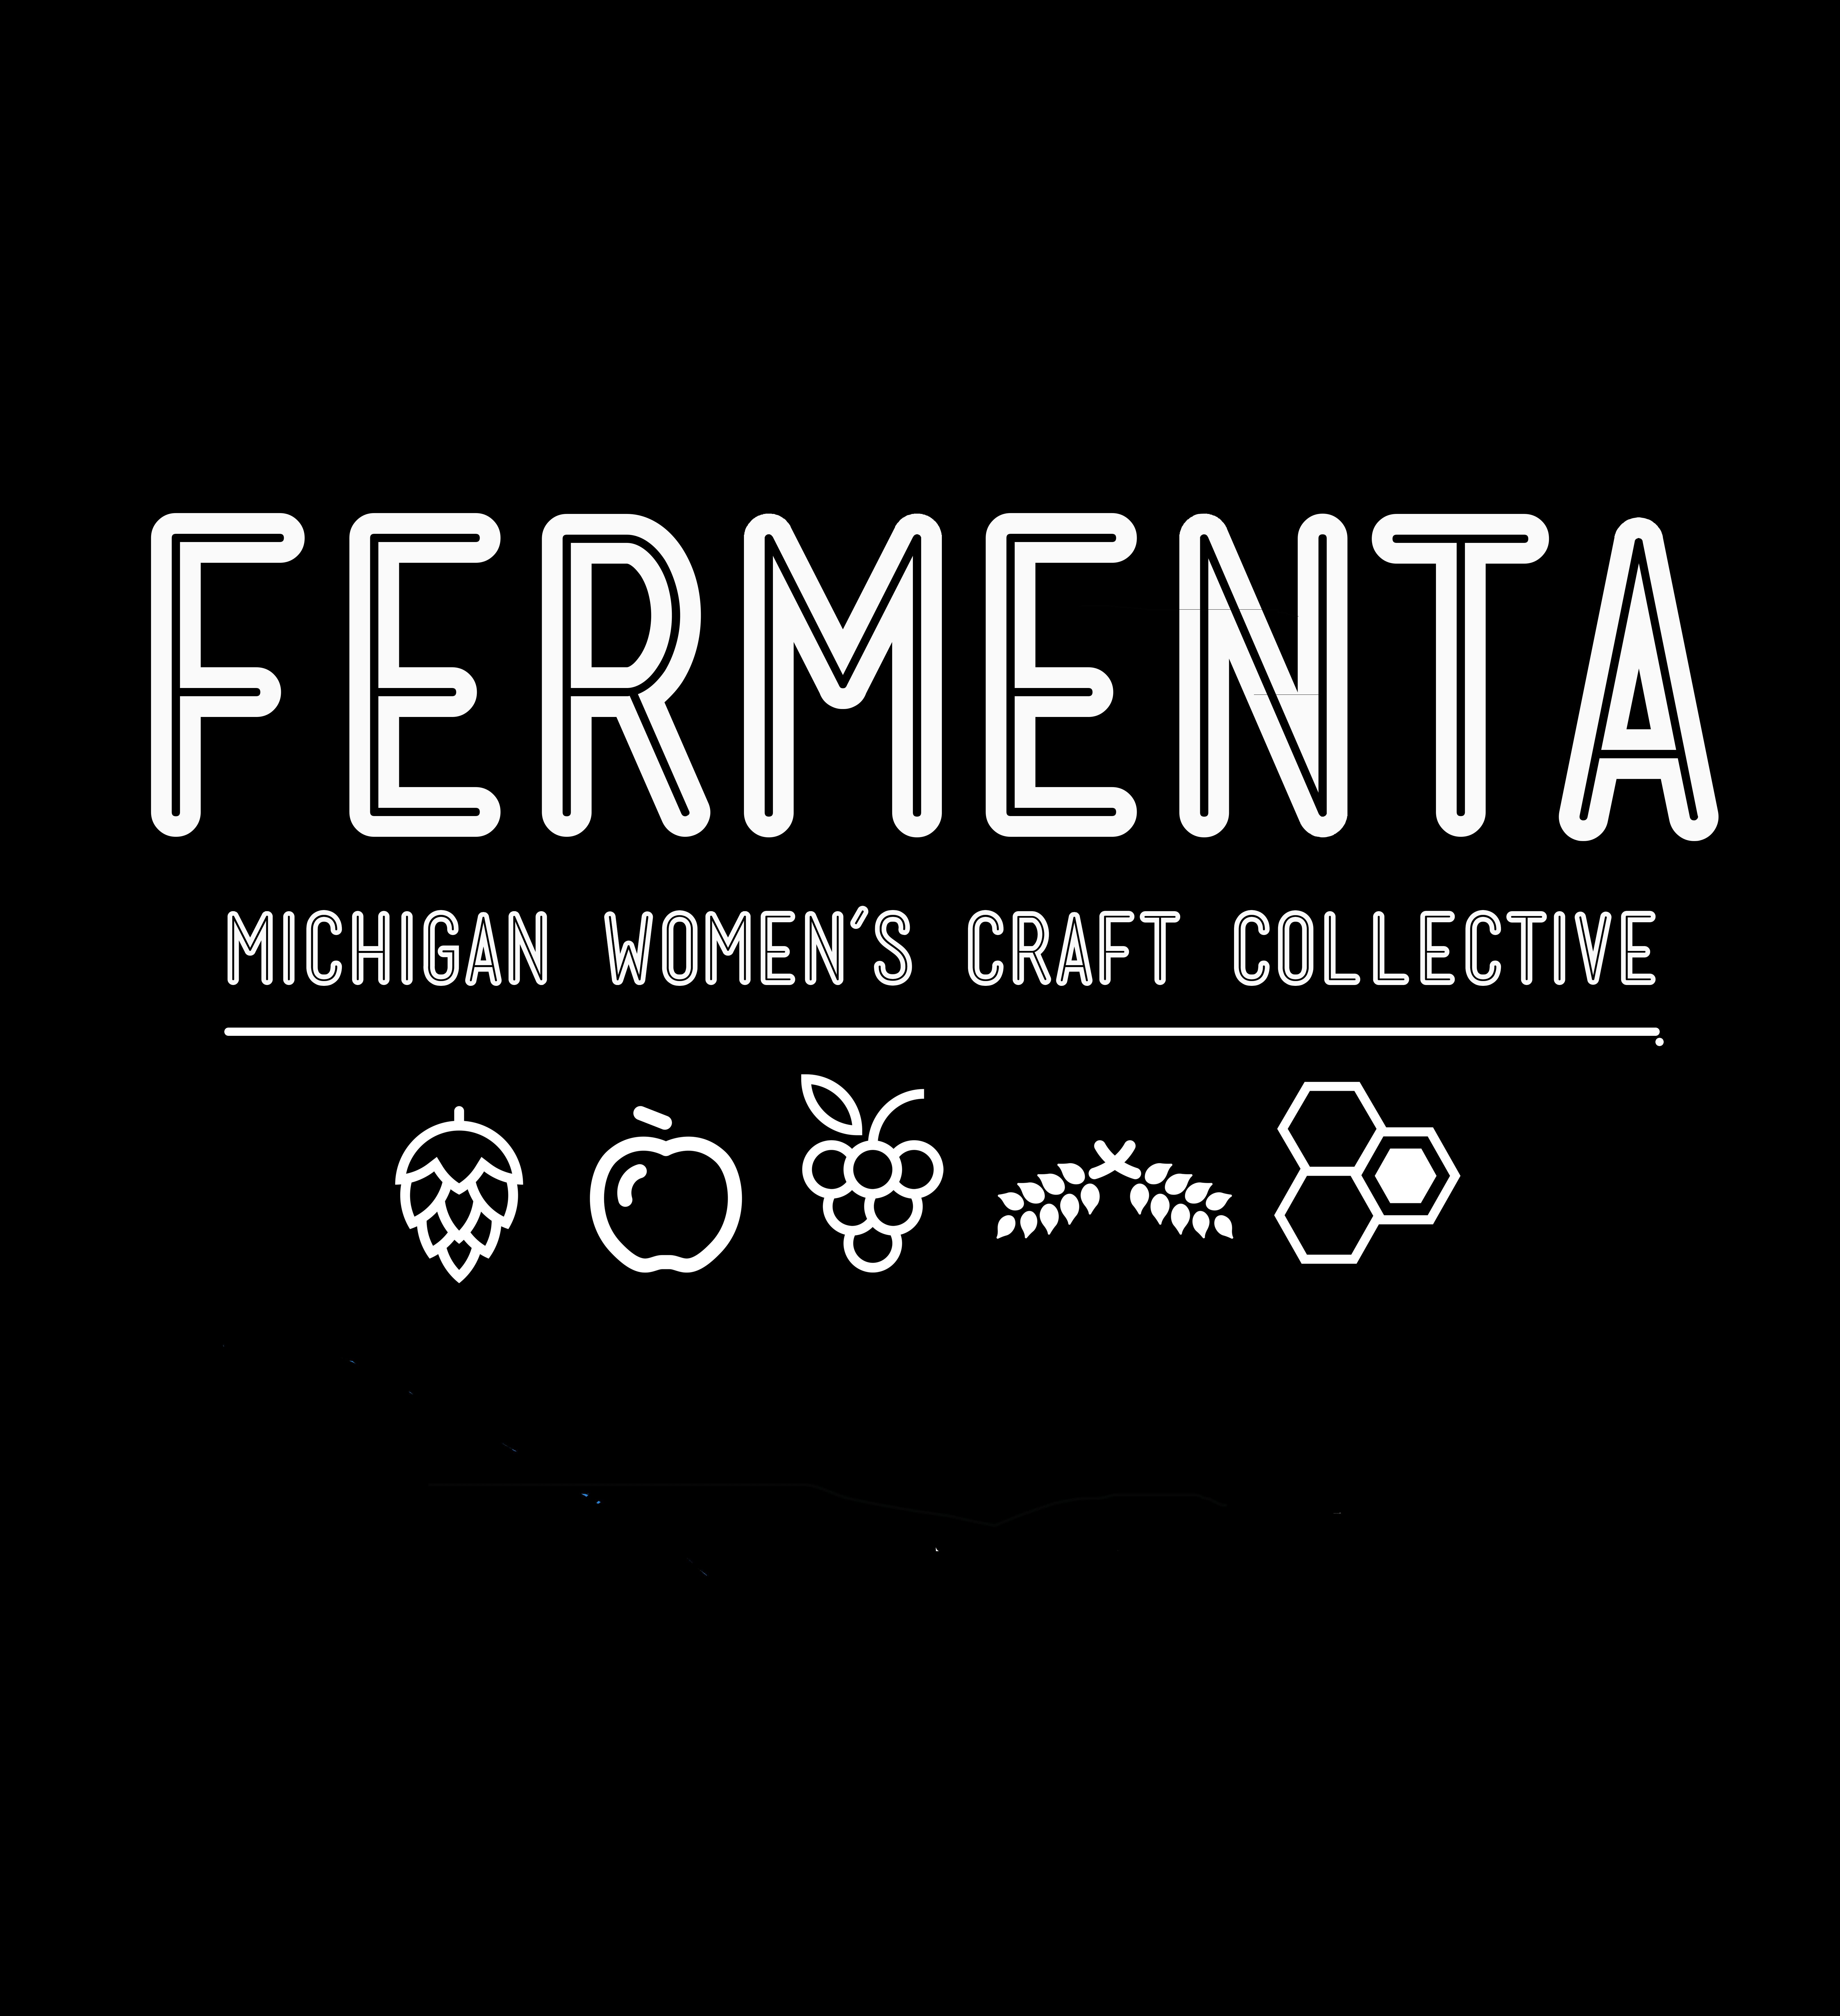 Fermenta Meet And Greet Event Nov 12th B Nektar Meadery